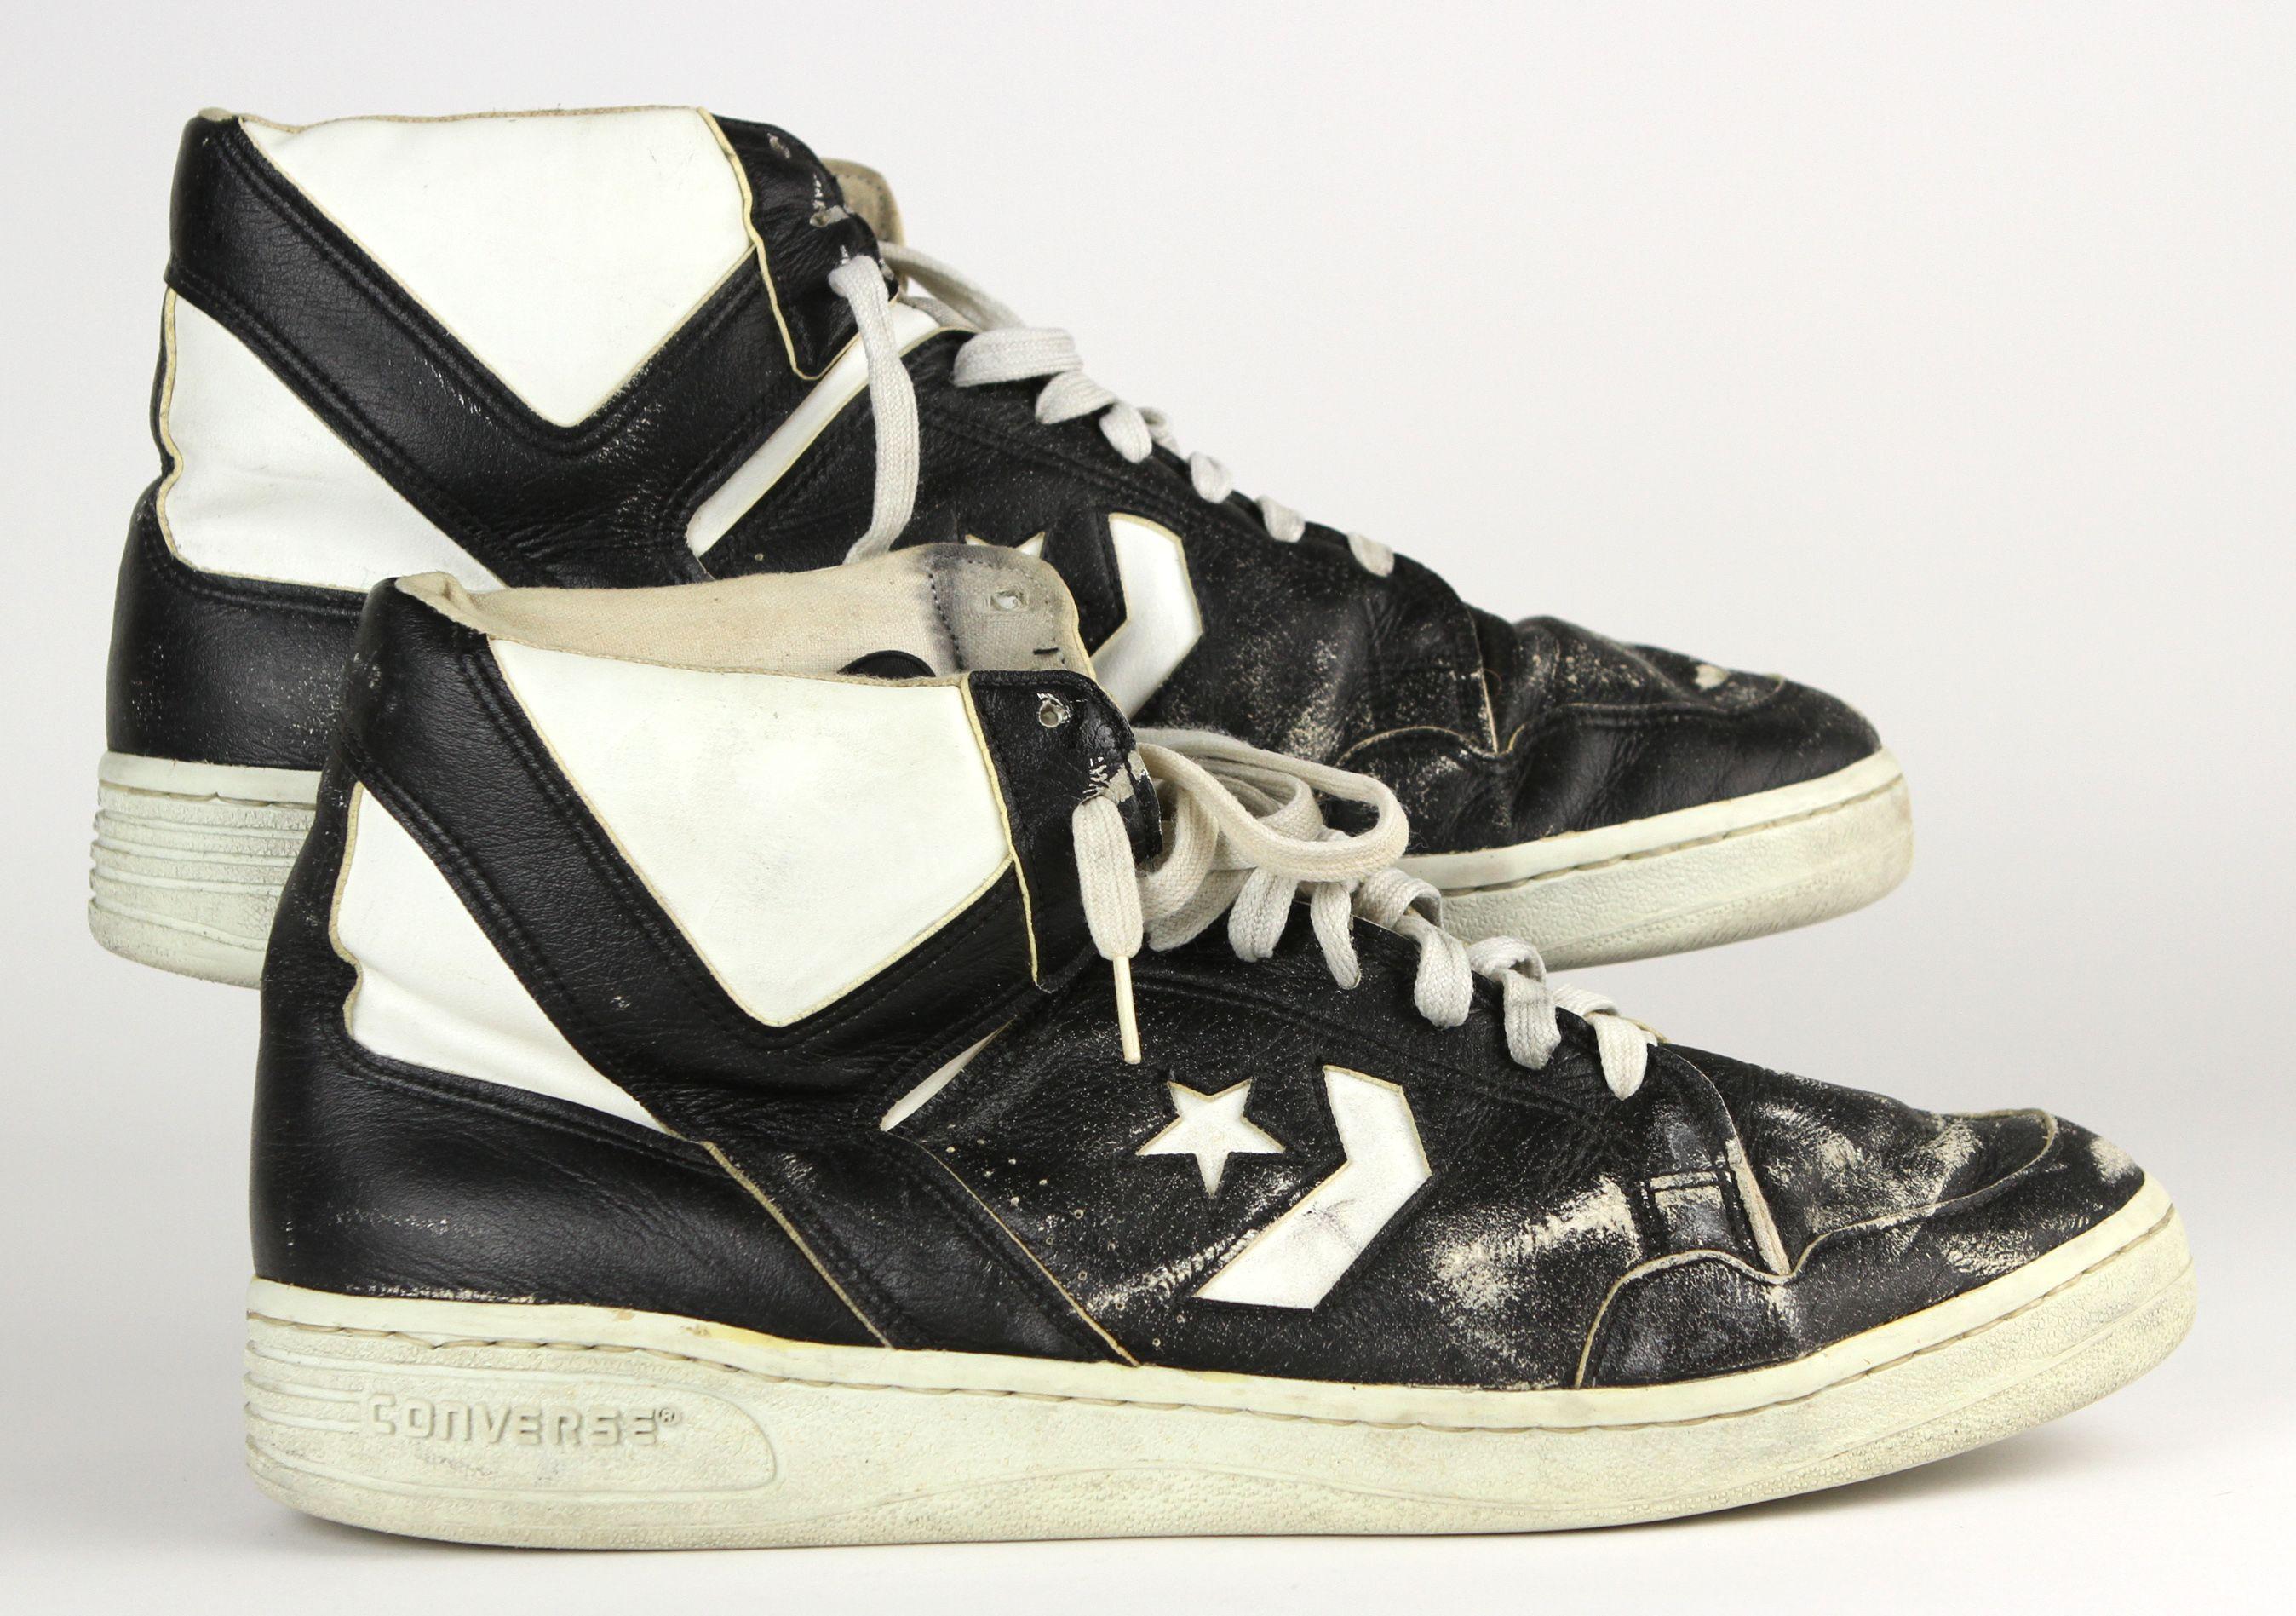 db927dddcaf Lot Detail - 1986 Larry Bird Boston Celtics Black Converse Dual Autographed  (JSA) NBA Championship   MVP Season Game Worn Shoes (Charity Auction ...